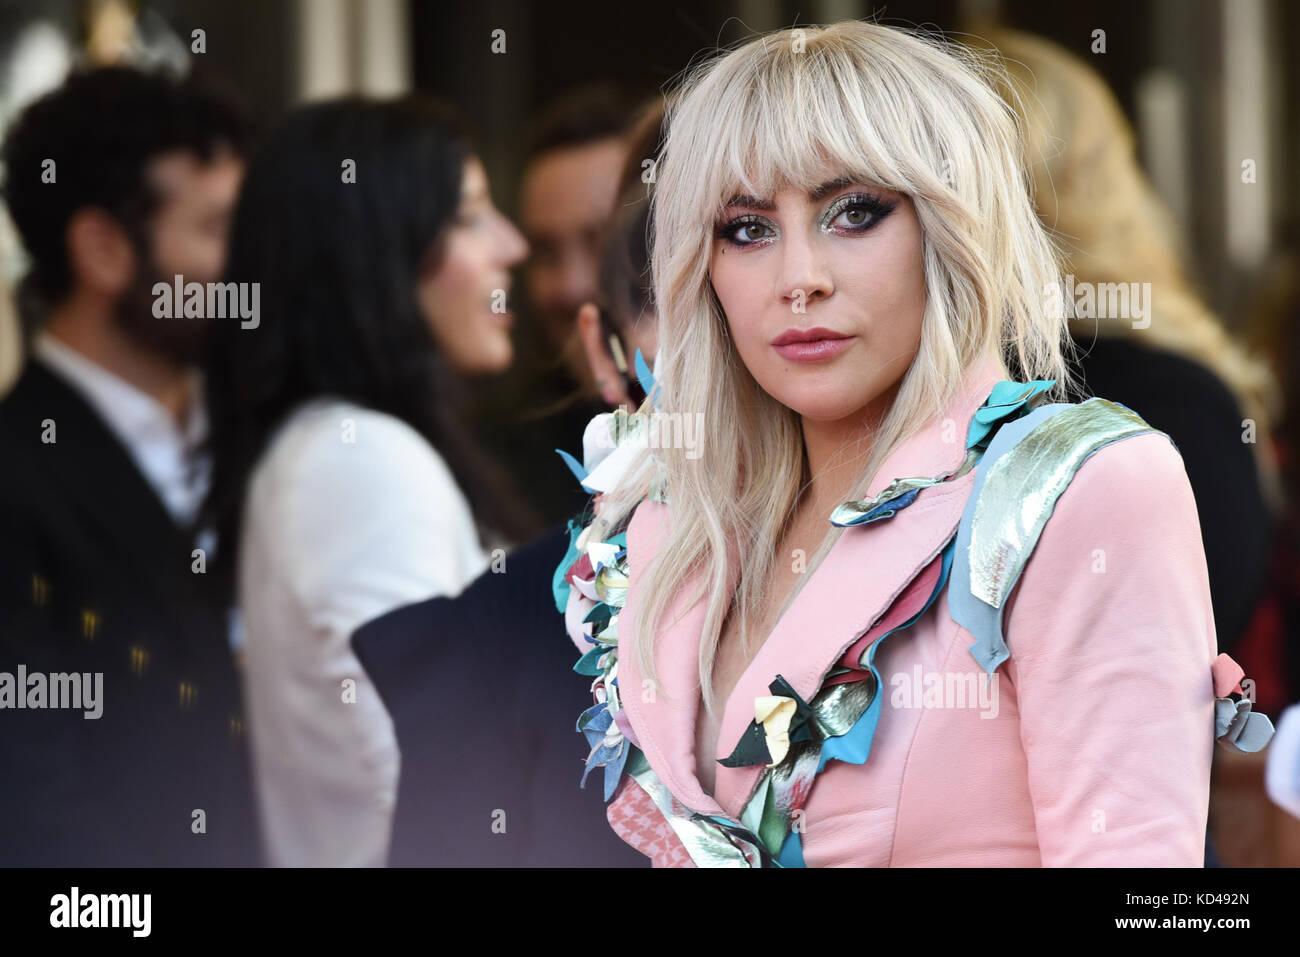 42nd Toronto International Film Festival - Lady Gaga Photocall  Featuring: Lady Gaga Where: Toronto, Canada When: Stock Photo